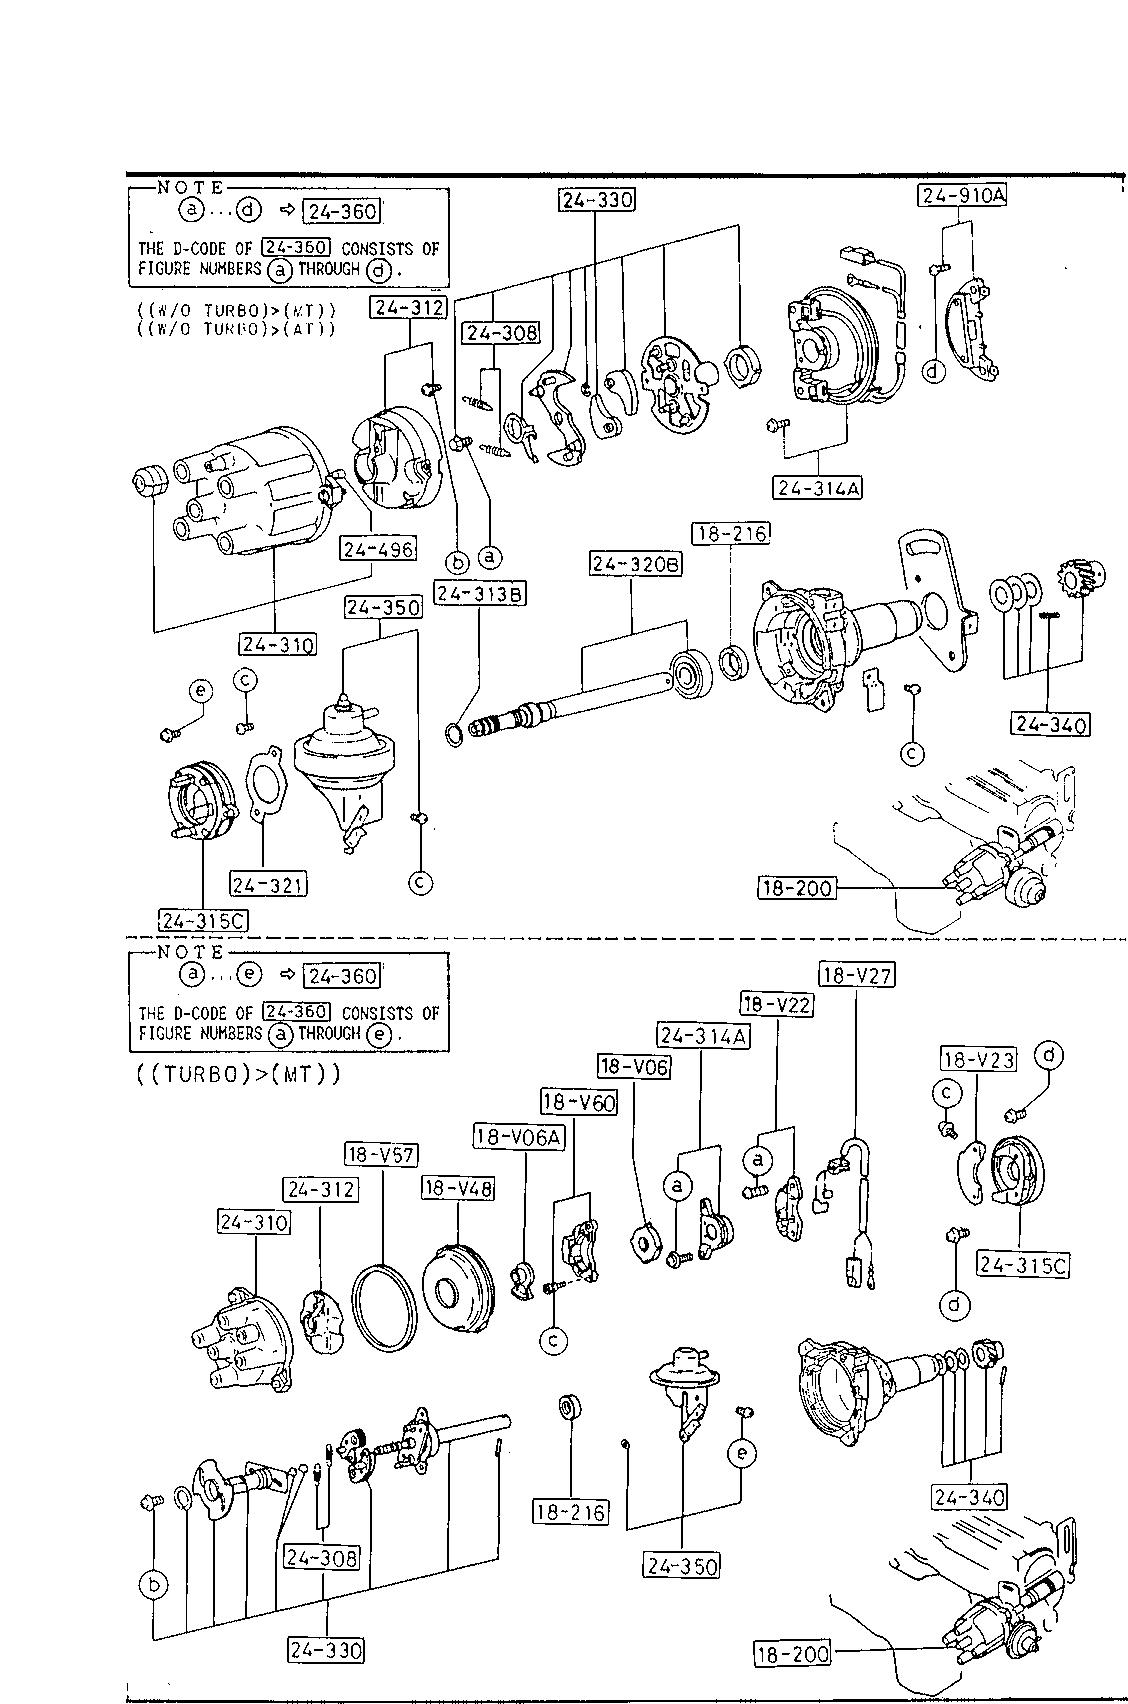 USA, 1986 626, GASOLINE-ENGINE SUPPLEMENT, 1820 - DISTRIBUTOR